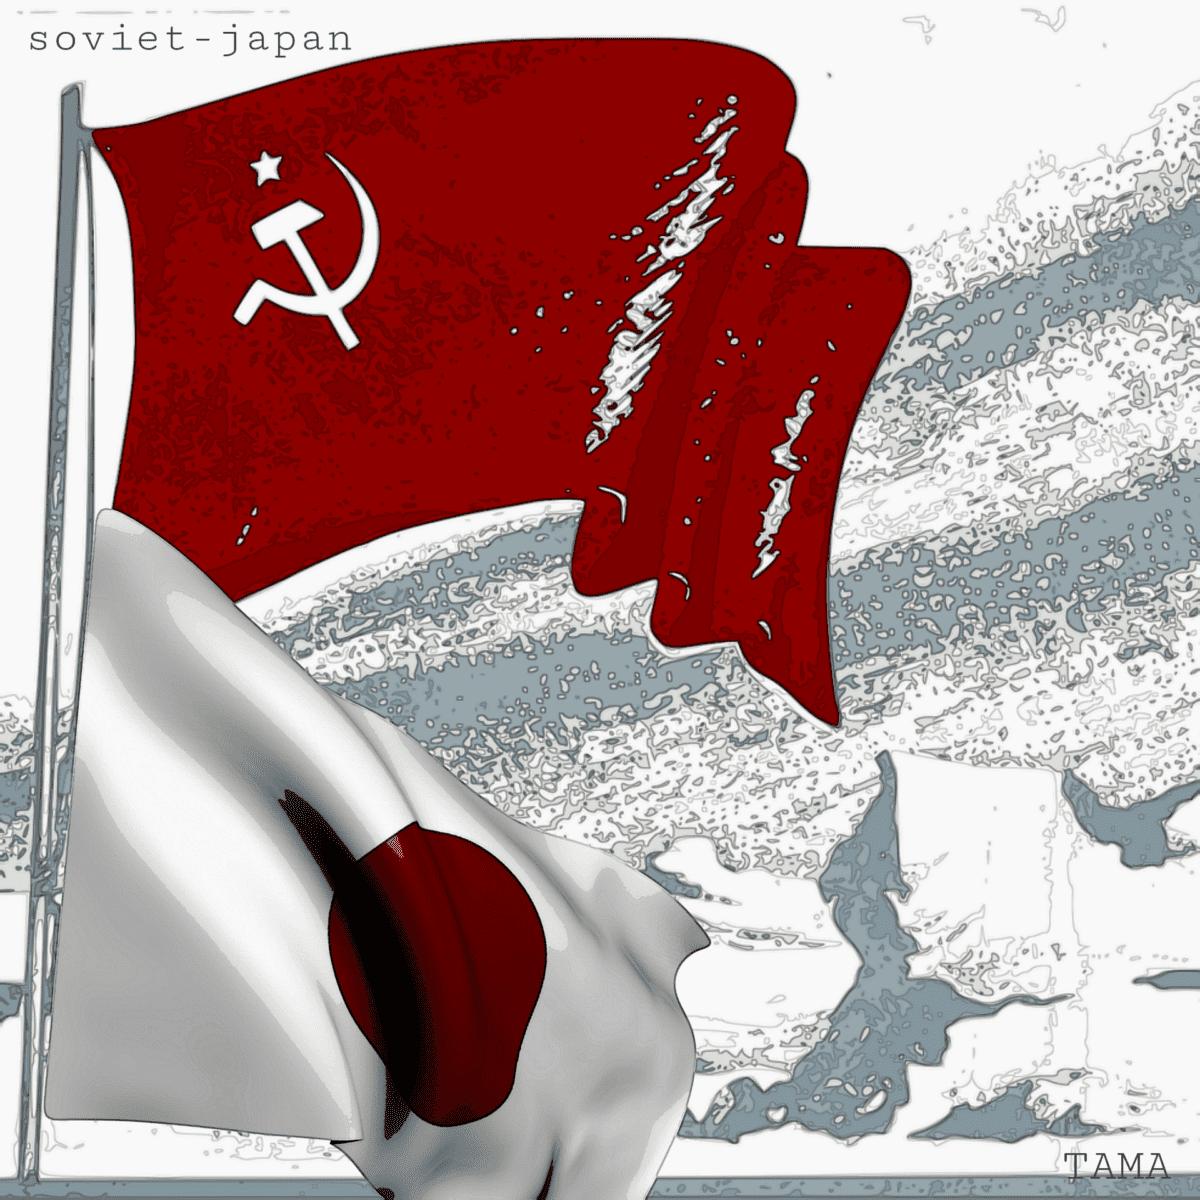 Soviet-Japanese Neutrality Pact